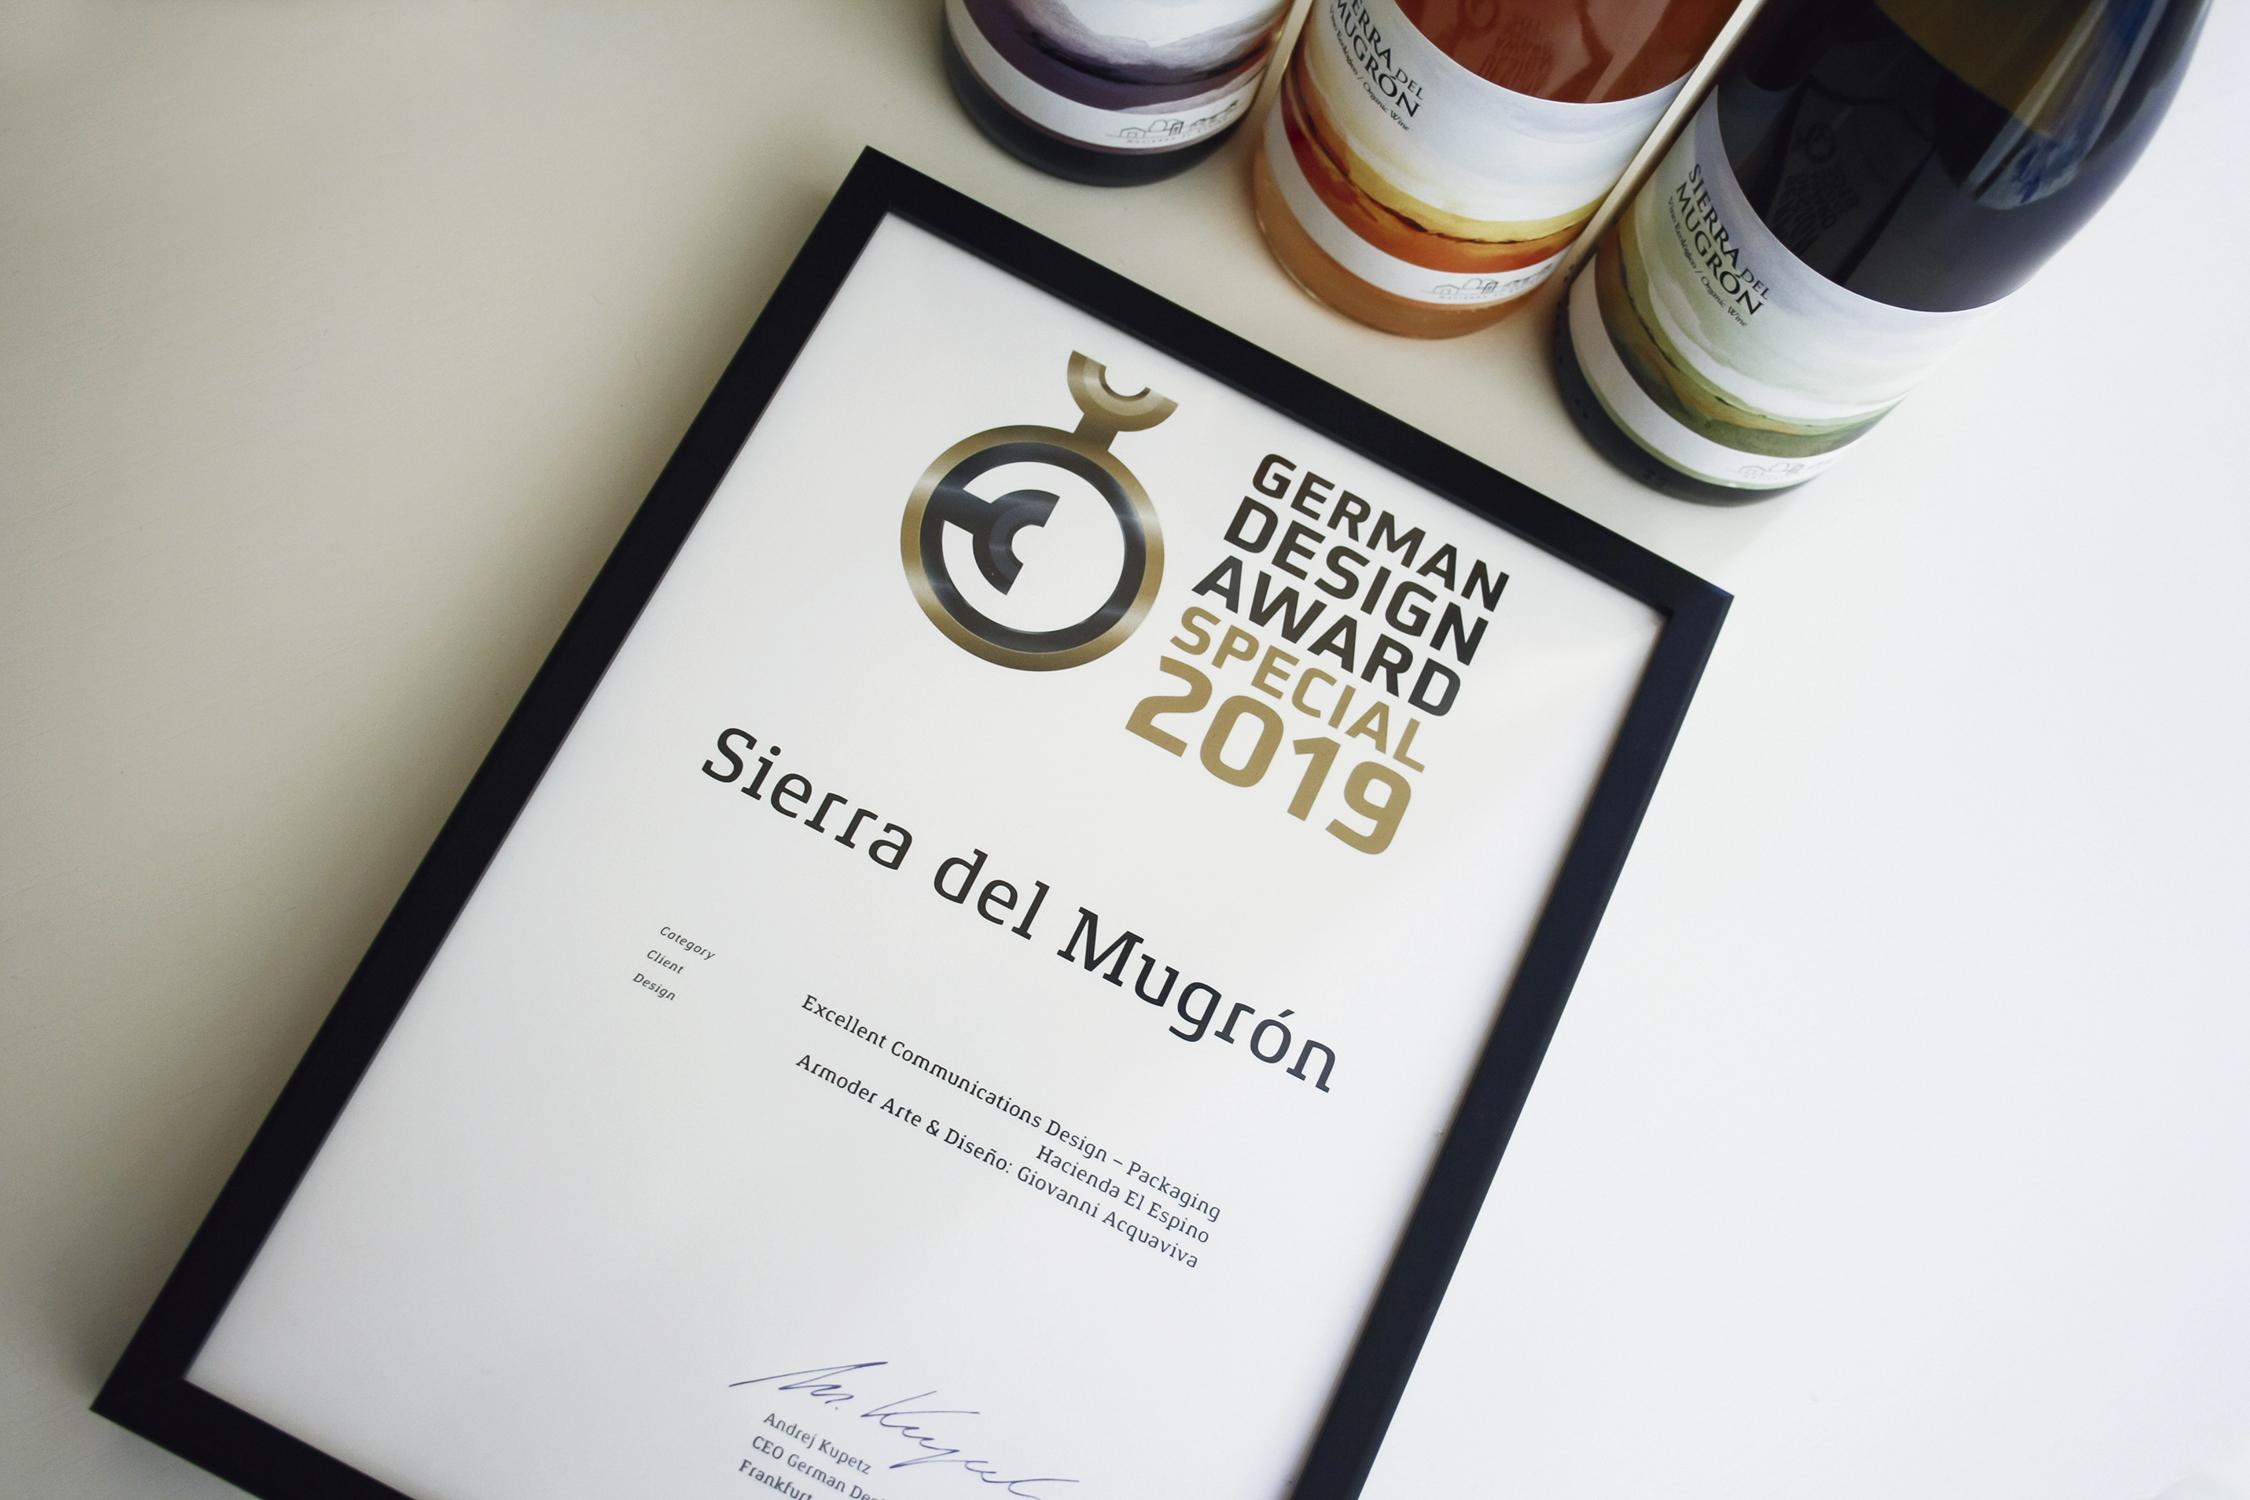 Sierra del Mugrón German Design Award Special Mention Armoder arte y diseño